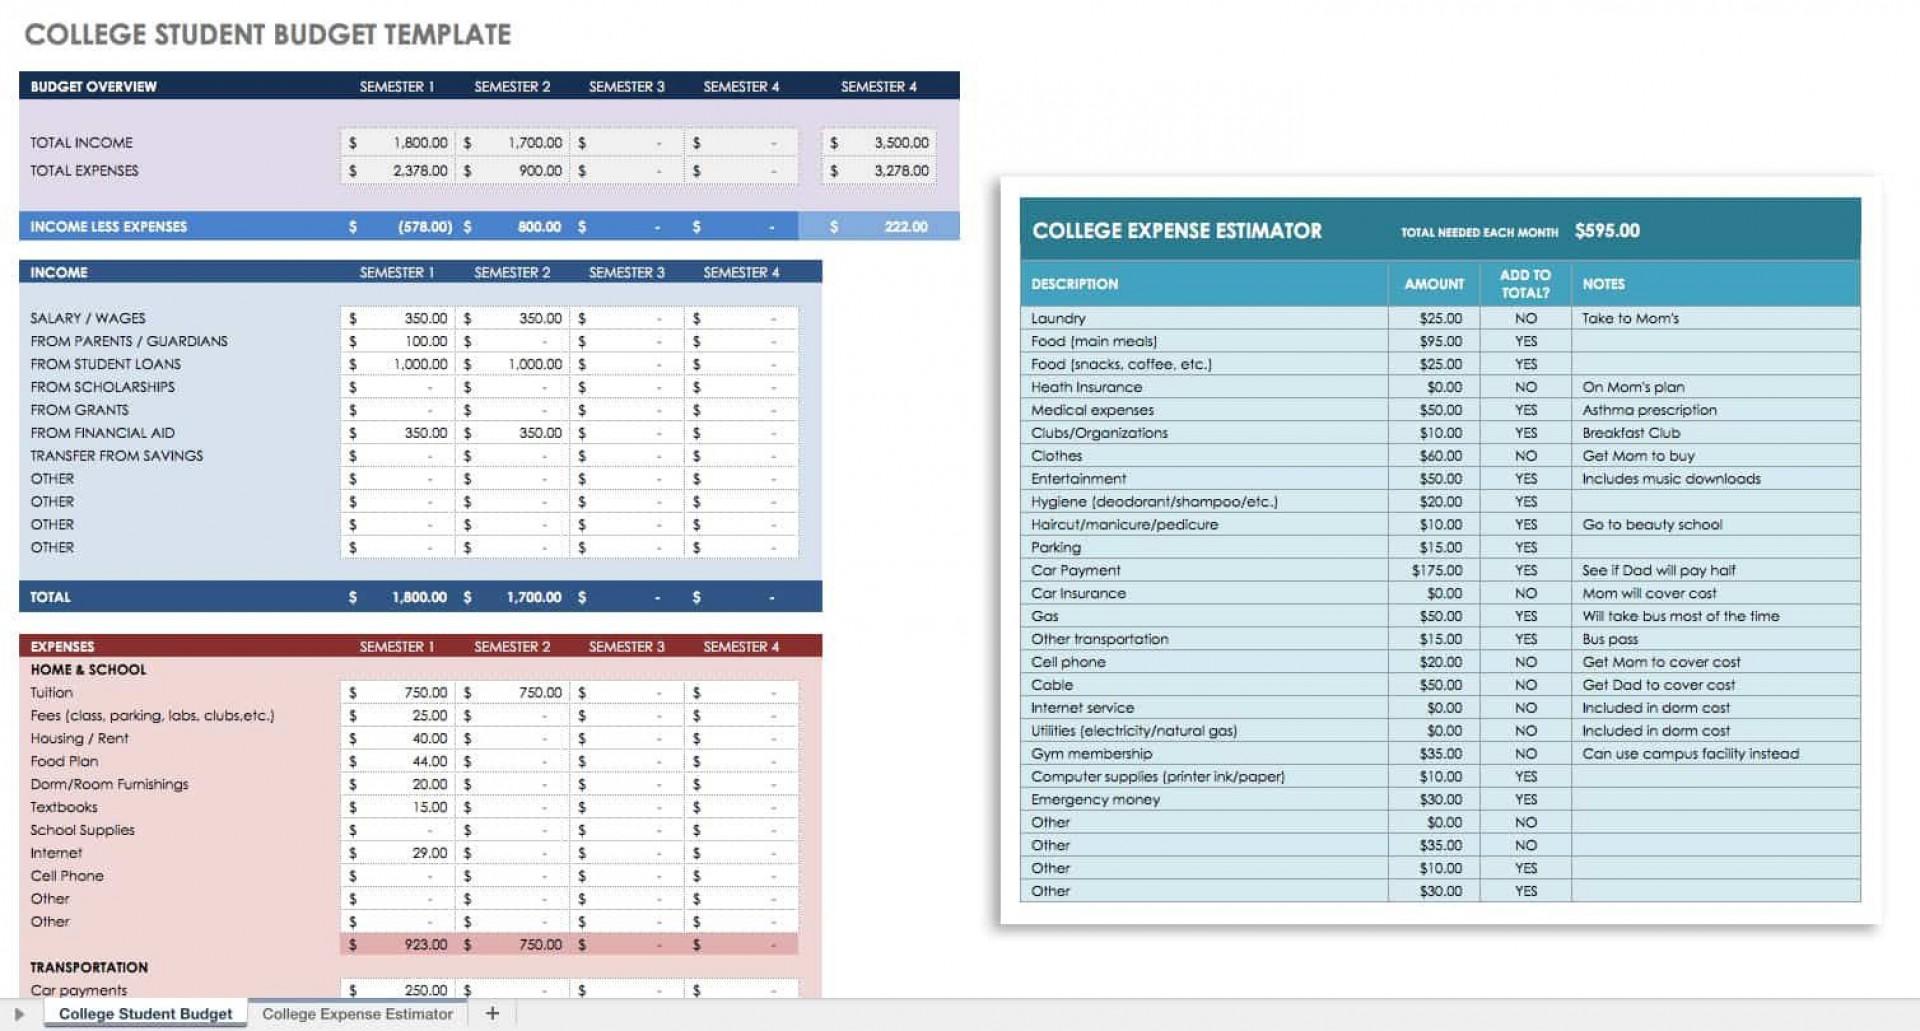 006 Unusual Financial Plan Template Excel Design  Strategic Busines Simple1920